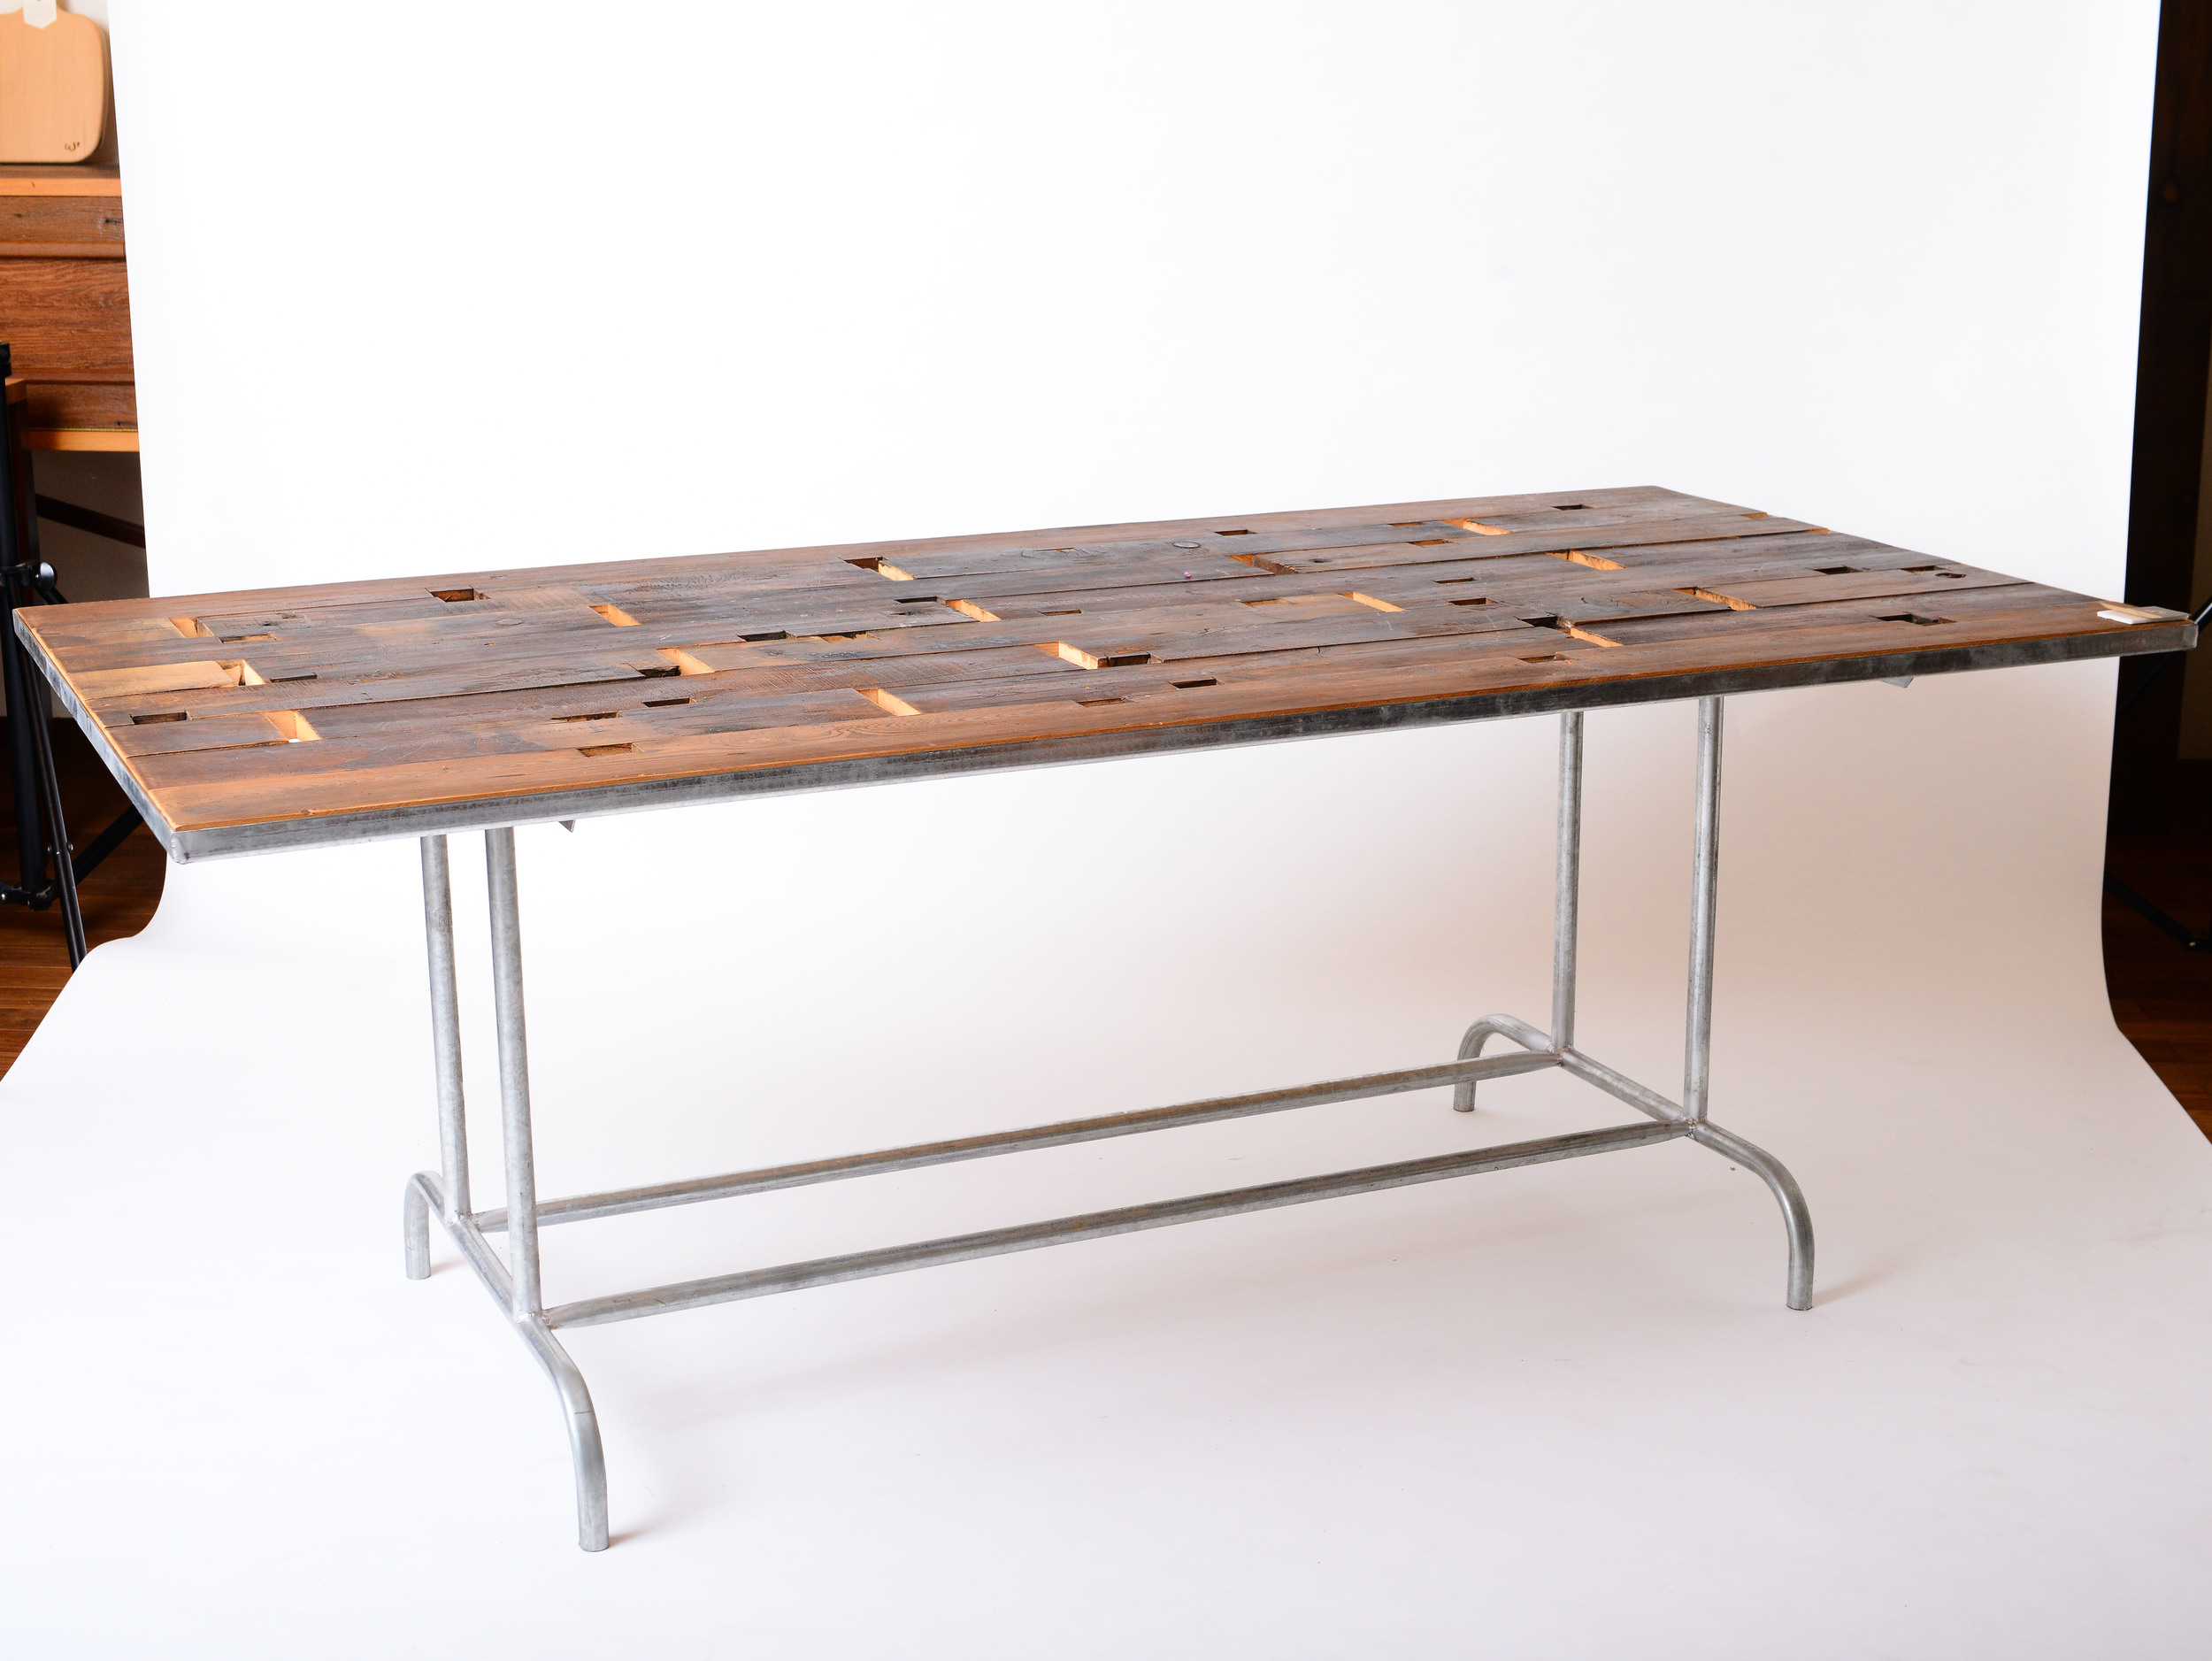 F-01 Laval dining table 亞管x栂木/台灣檜木  Size:L150~300xW80~90xH75cm  NT 26,000起 (未稅,運費另計)